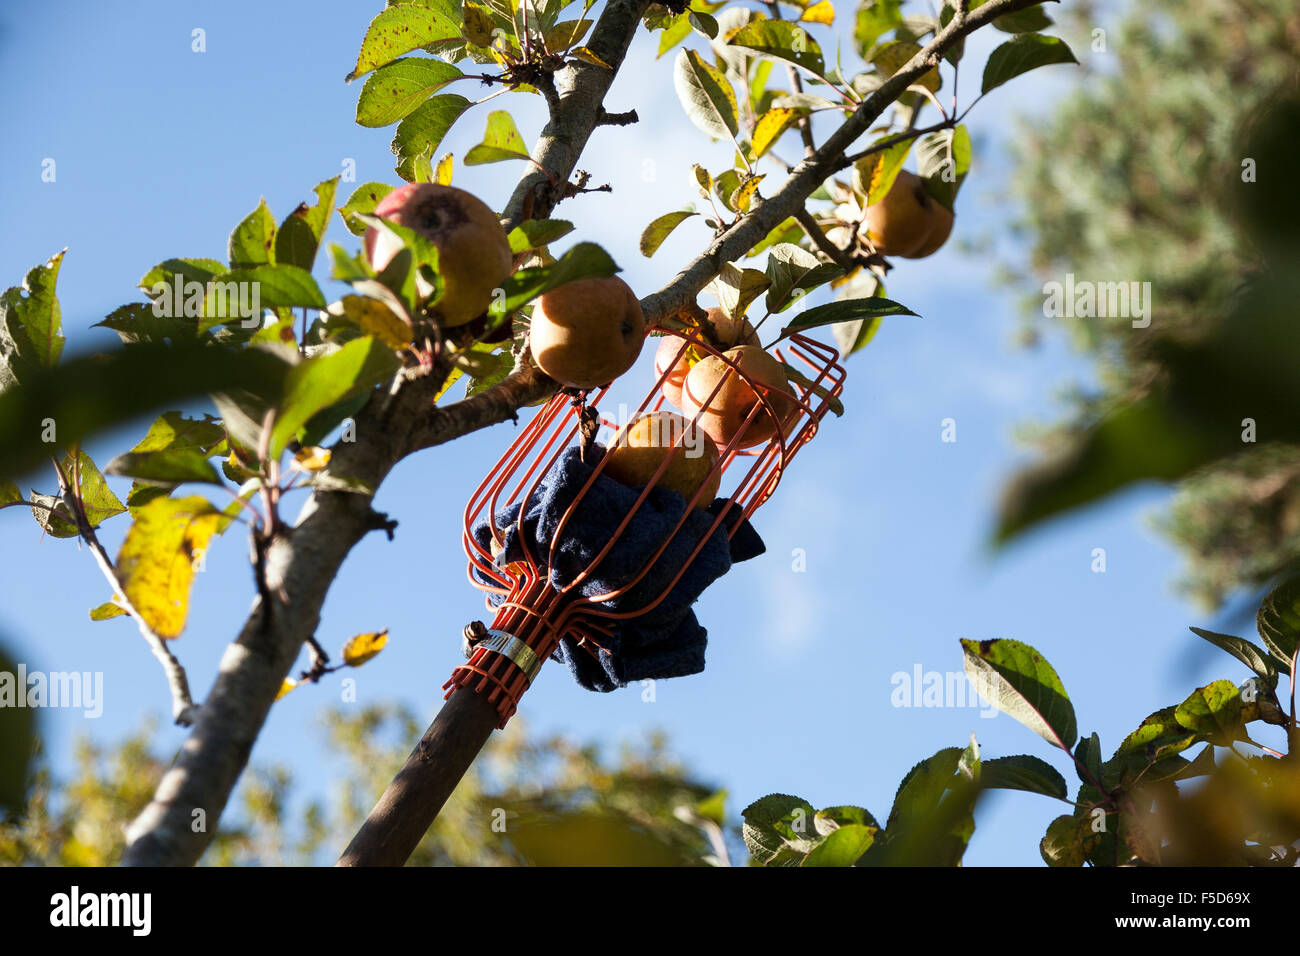 Apple picking en Devon Orchard, árbol, fruta, vector, huerto, cosecha, producir, maduras, Apple tree, contorno, Imagen De Stock